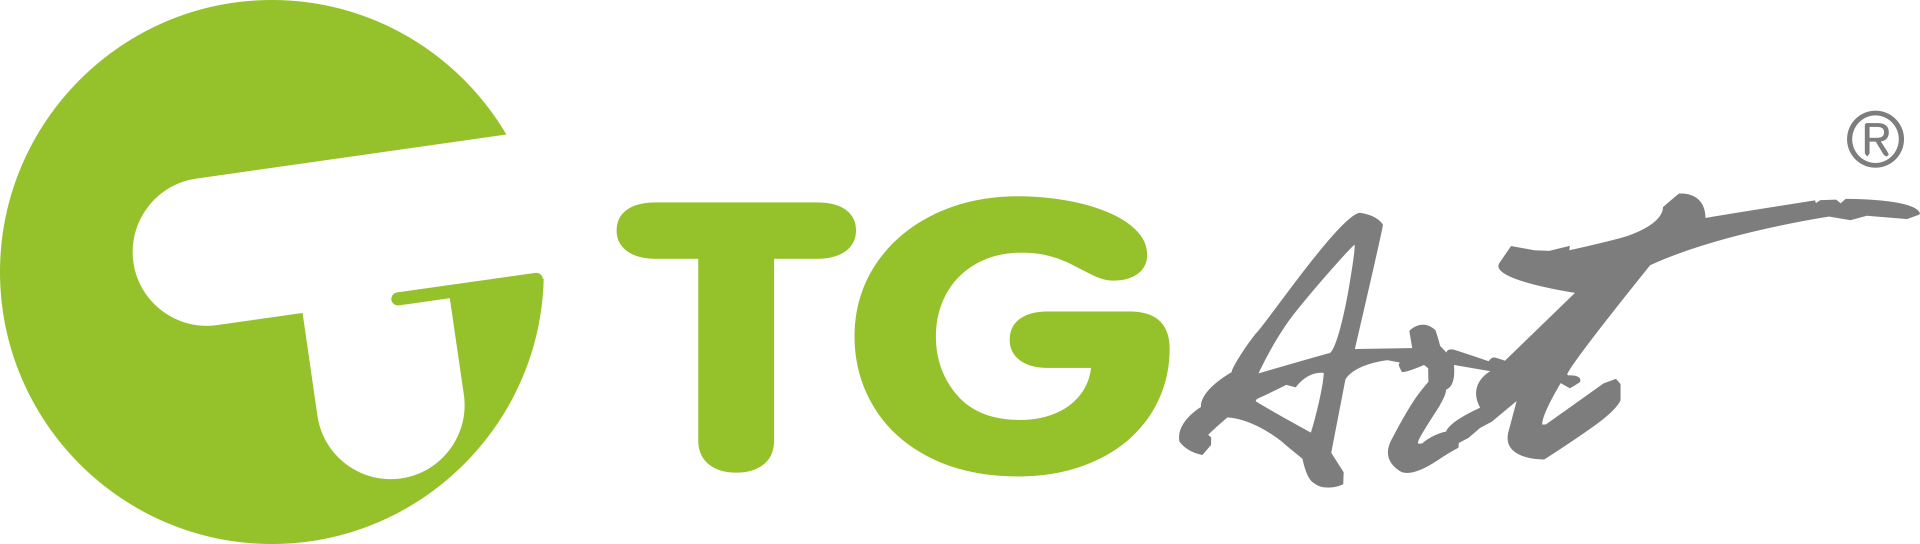 TGART- proizvodi od pleksiglasa, akrila, digitalni tisak